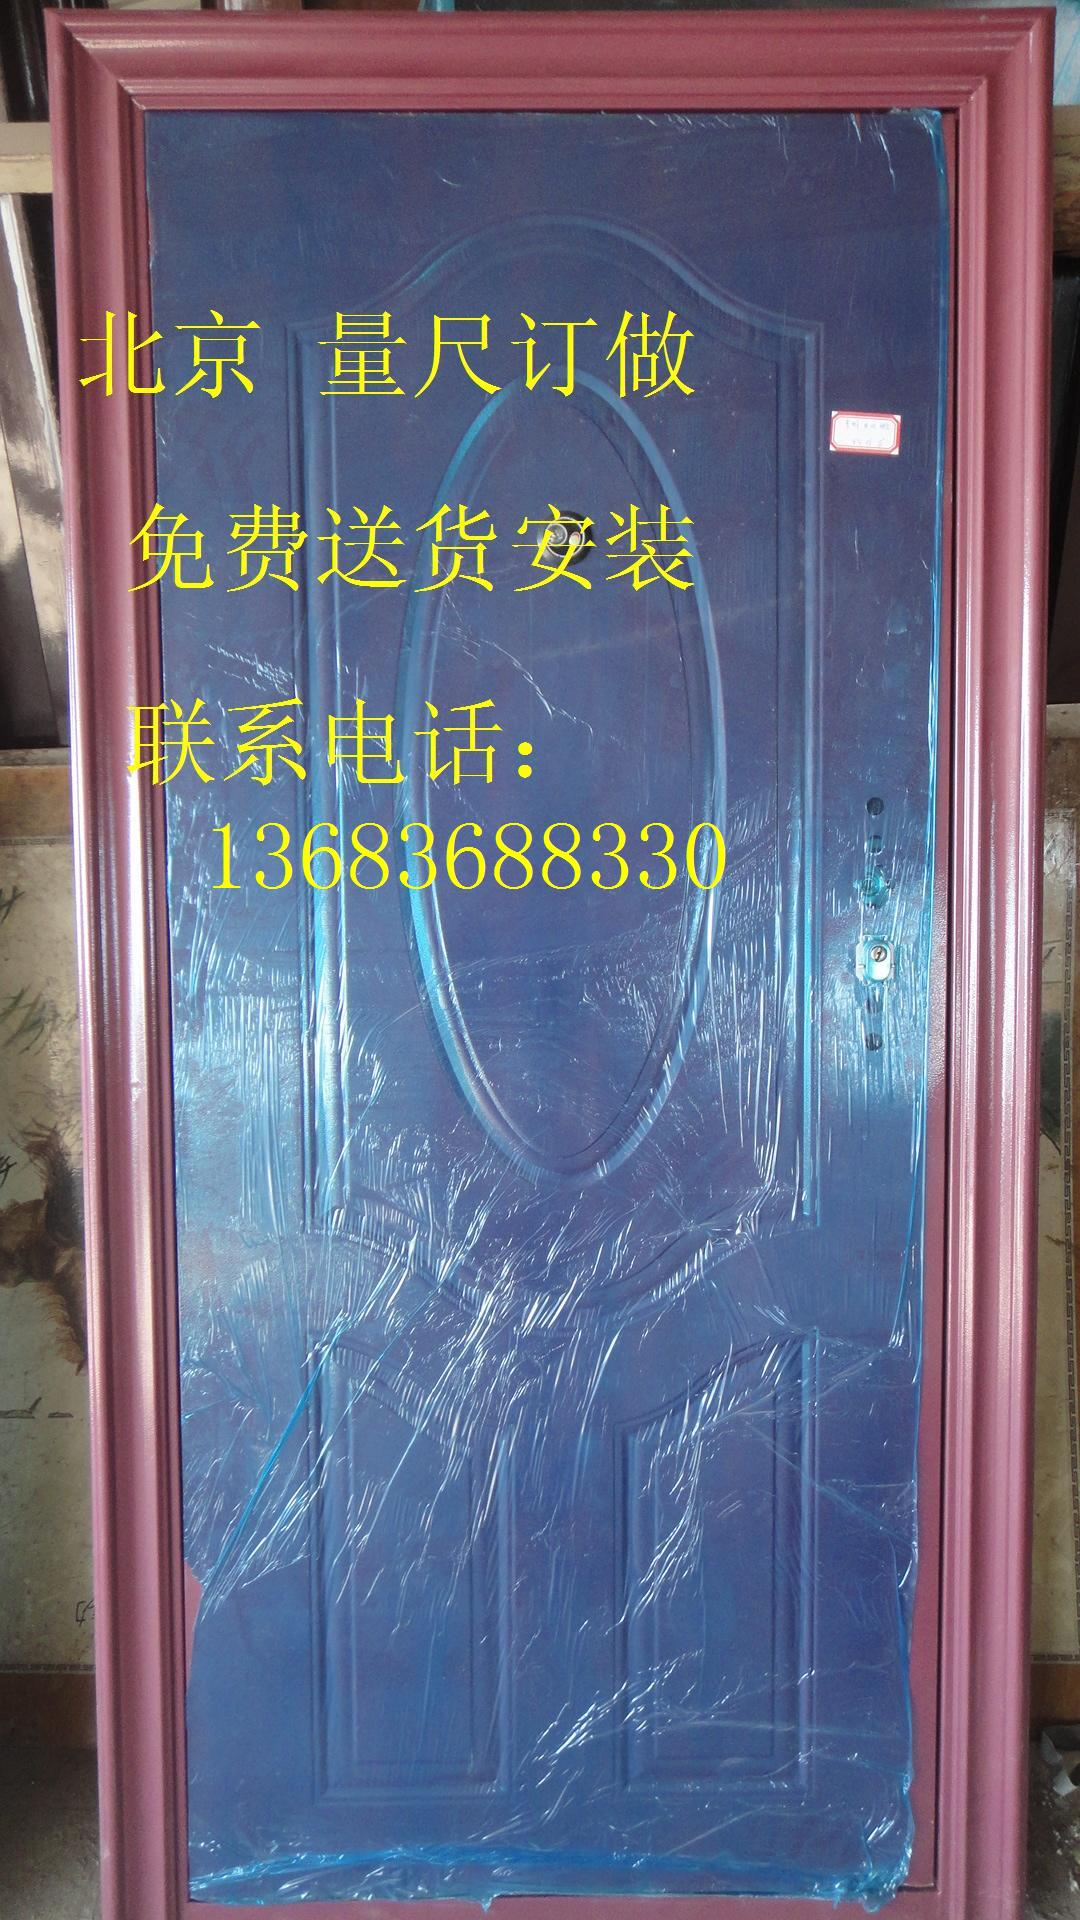 Дверь входная Fang Xin door industry